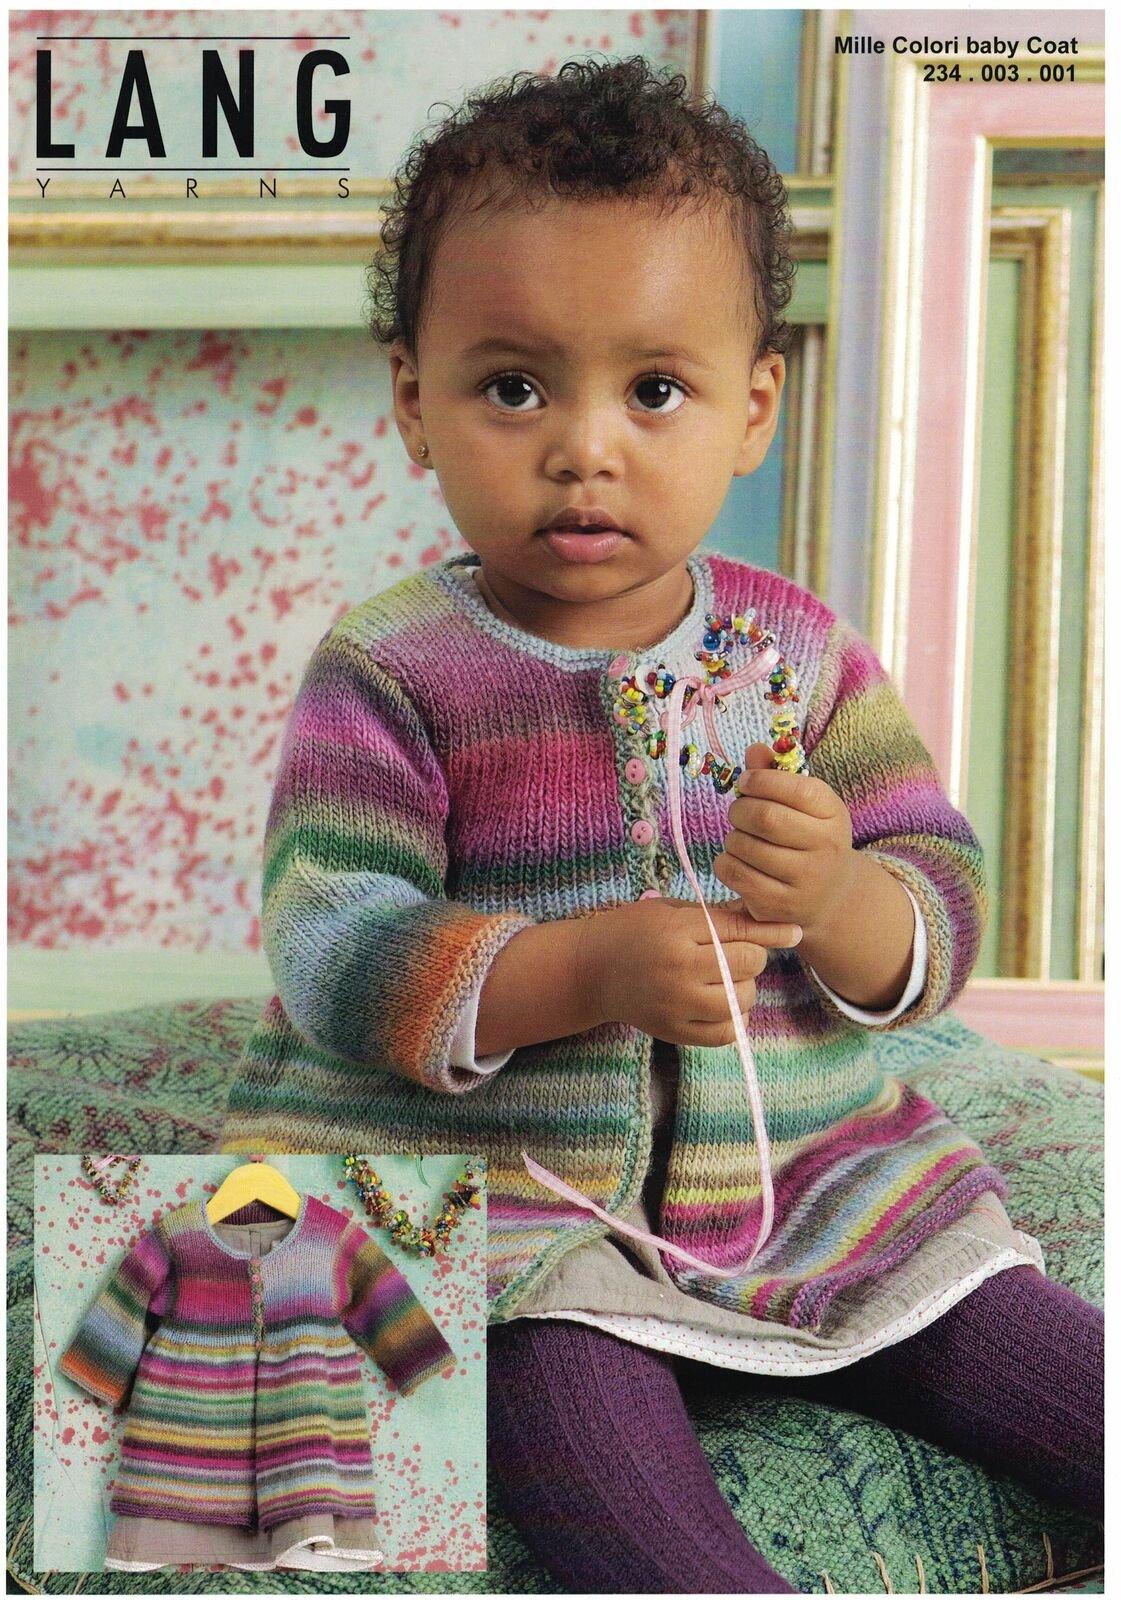 Lang Yarns - Mille Colori Baby Coat - Pattern Leaflet